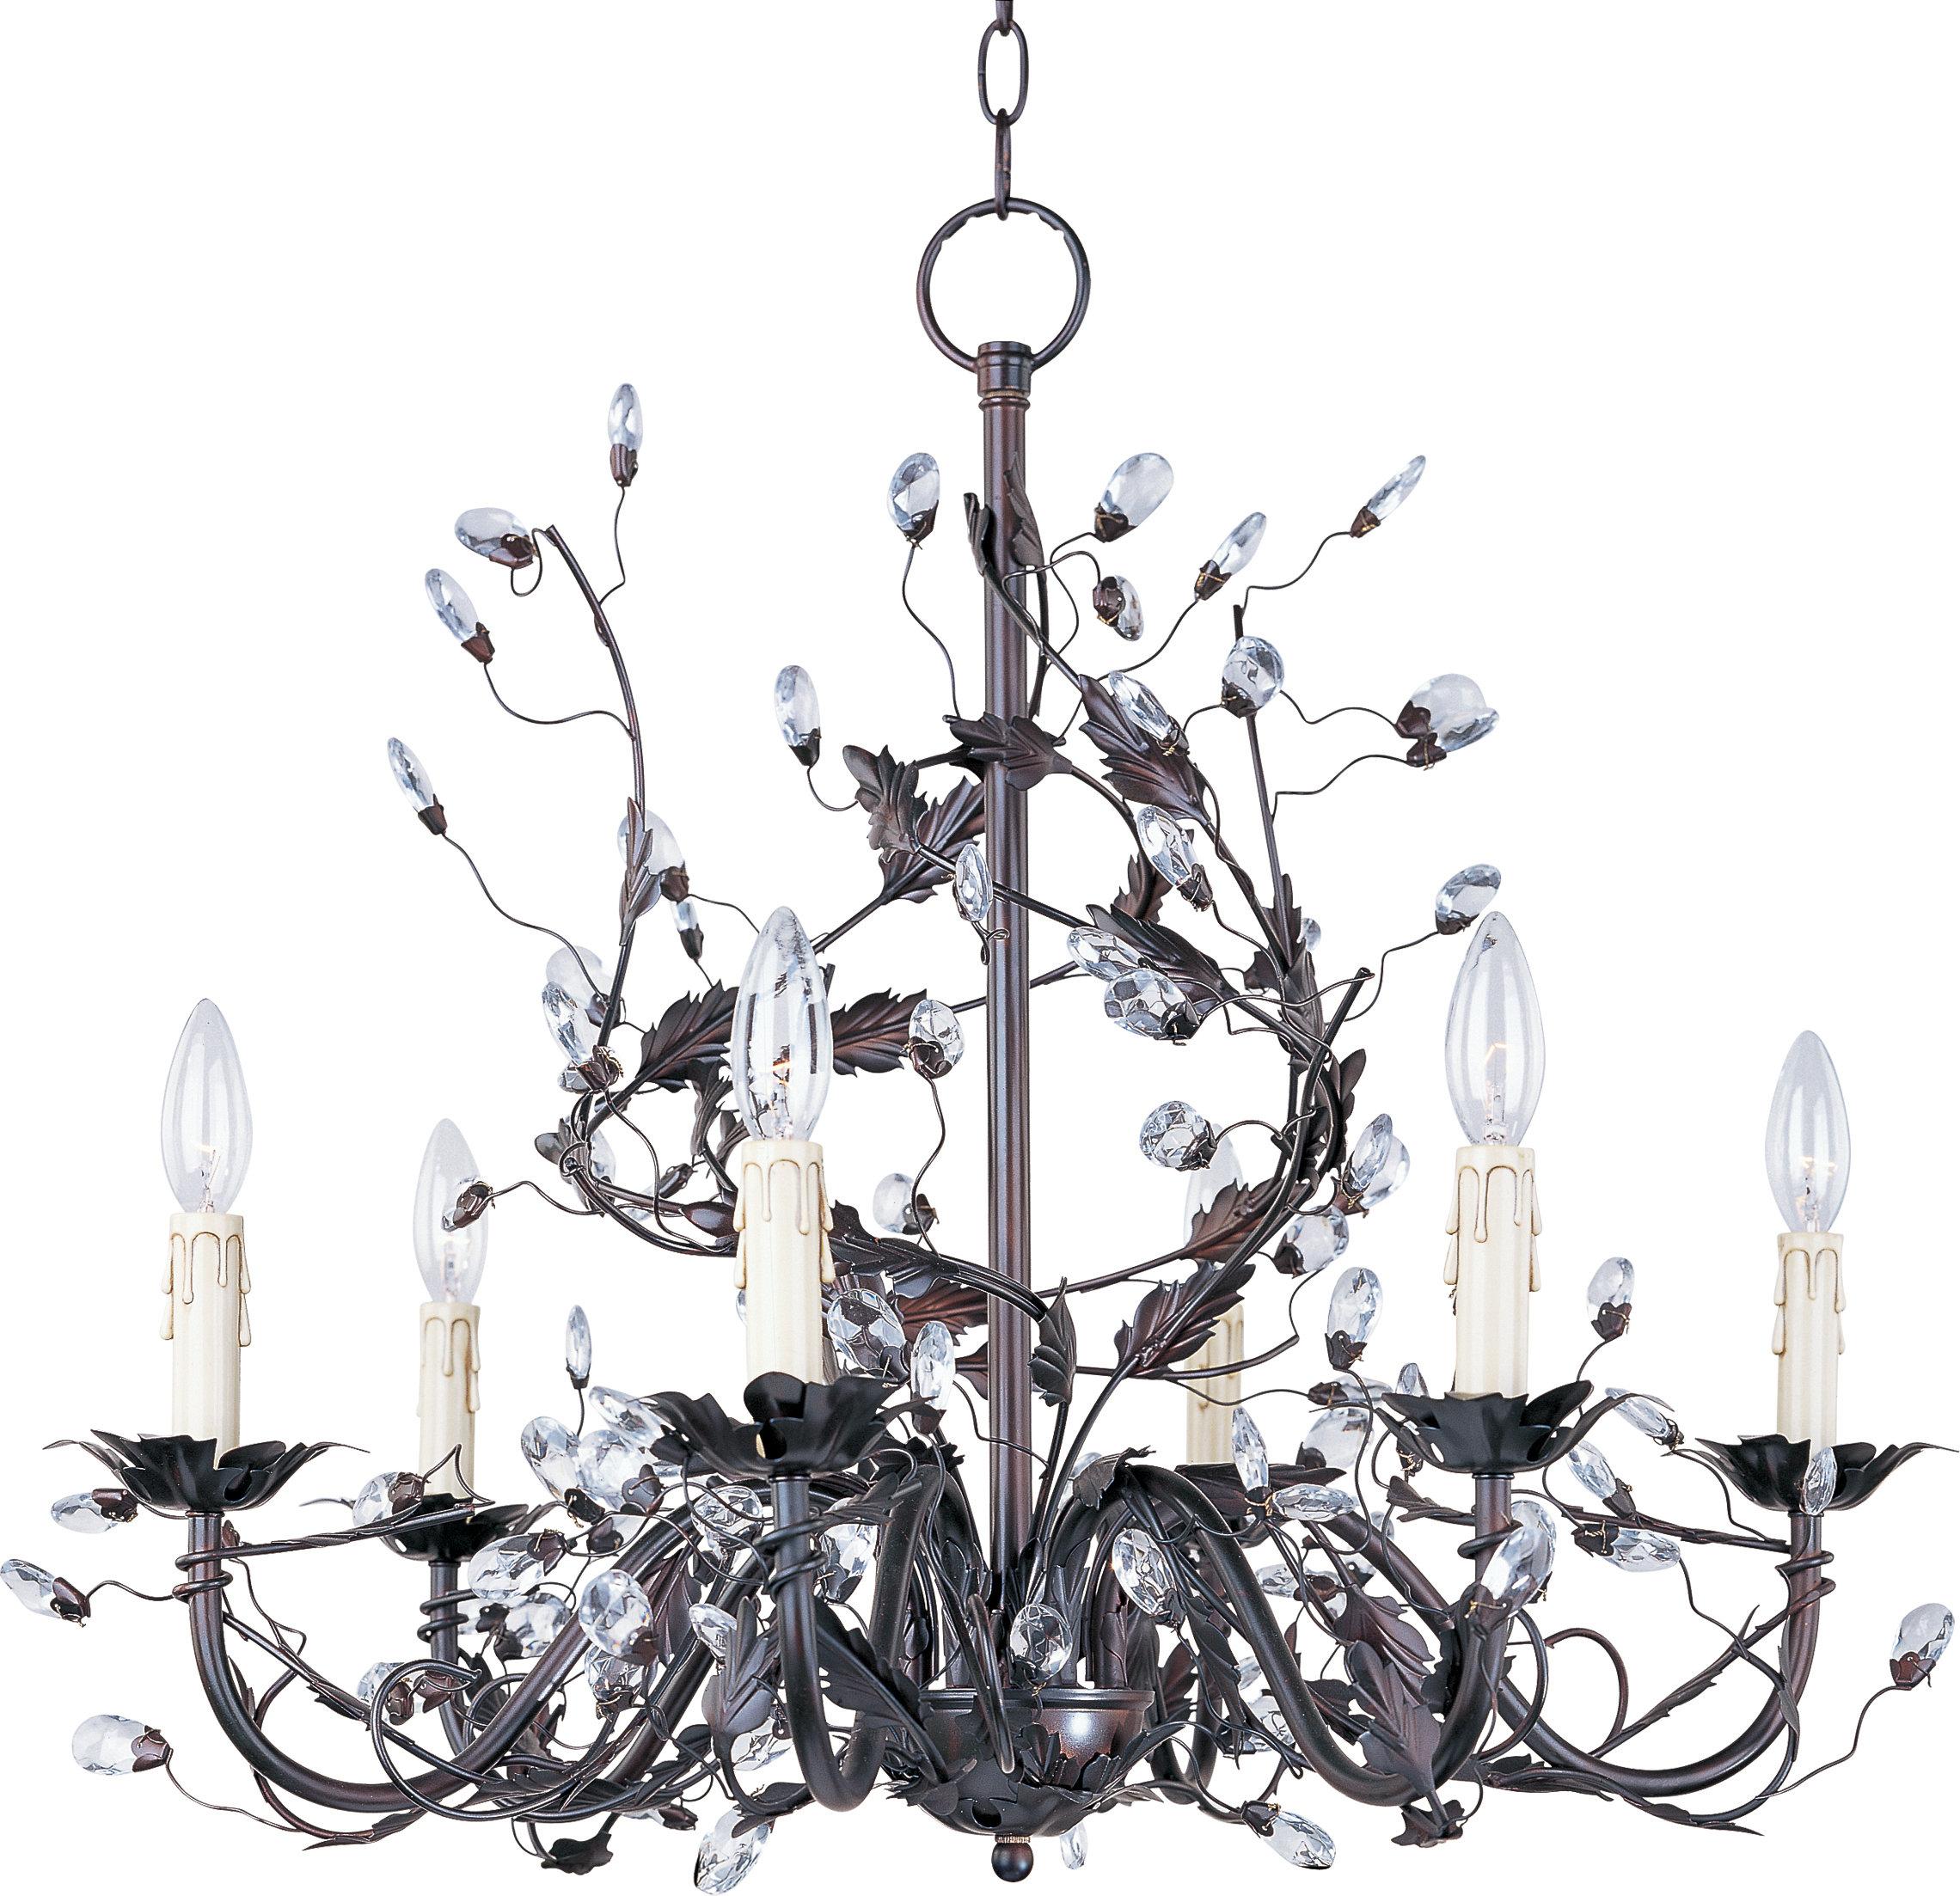 Kaiya 6 Light Candle Style Chandelier Regarding Widely Used Hesse 5 Light Candle Style Chandeliers (View 10 of 25)